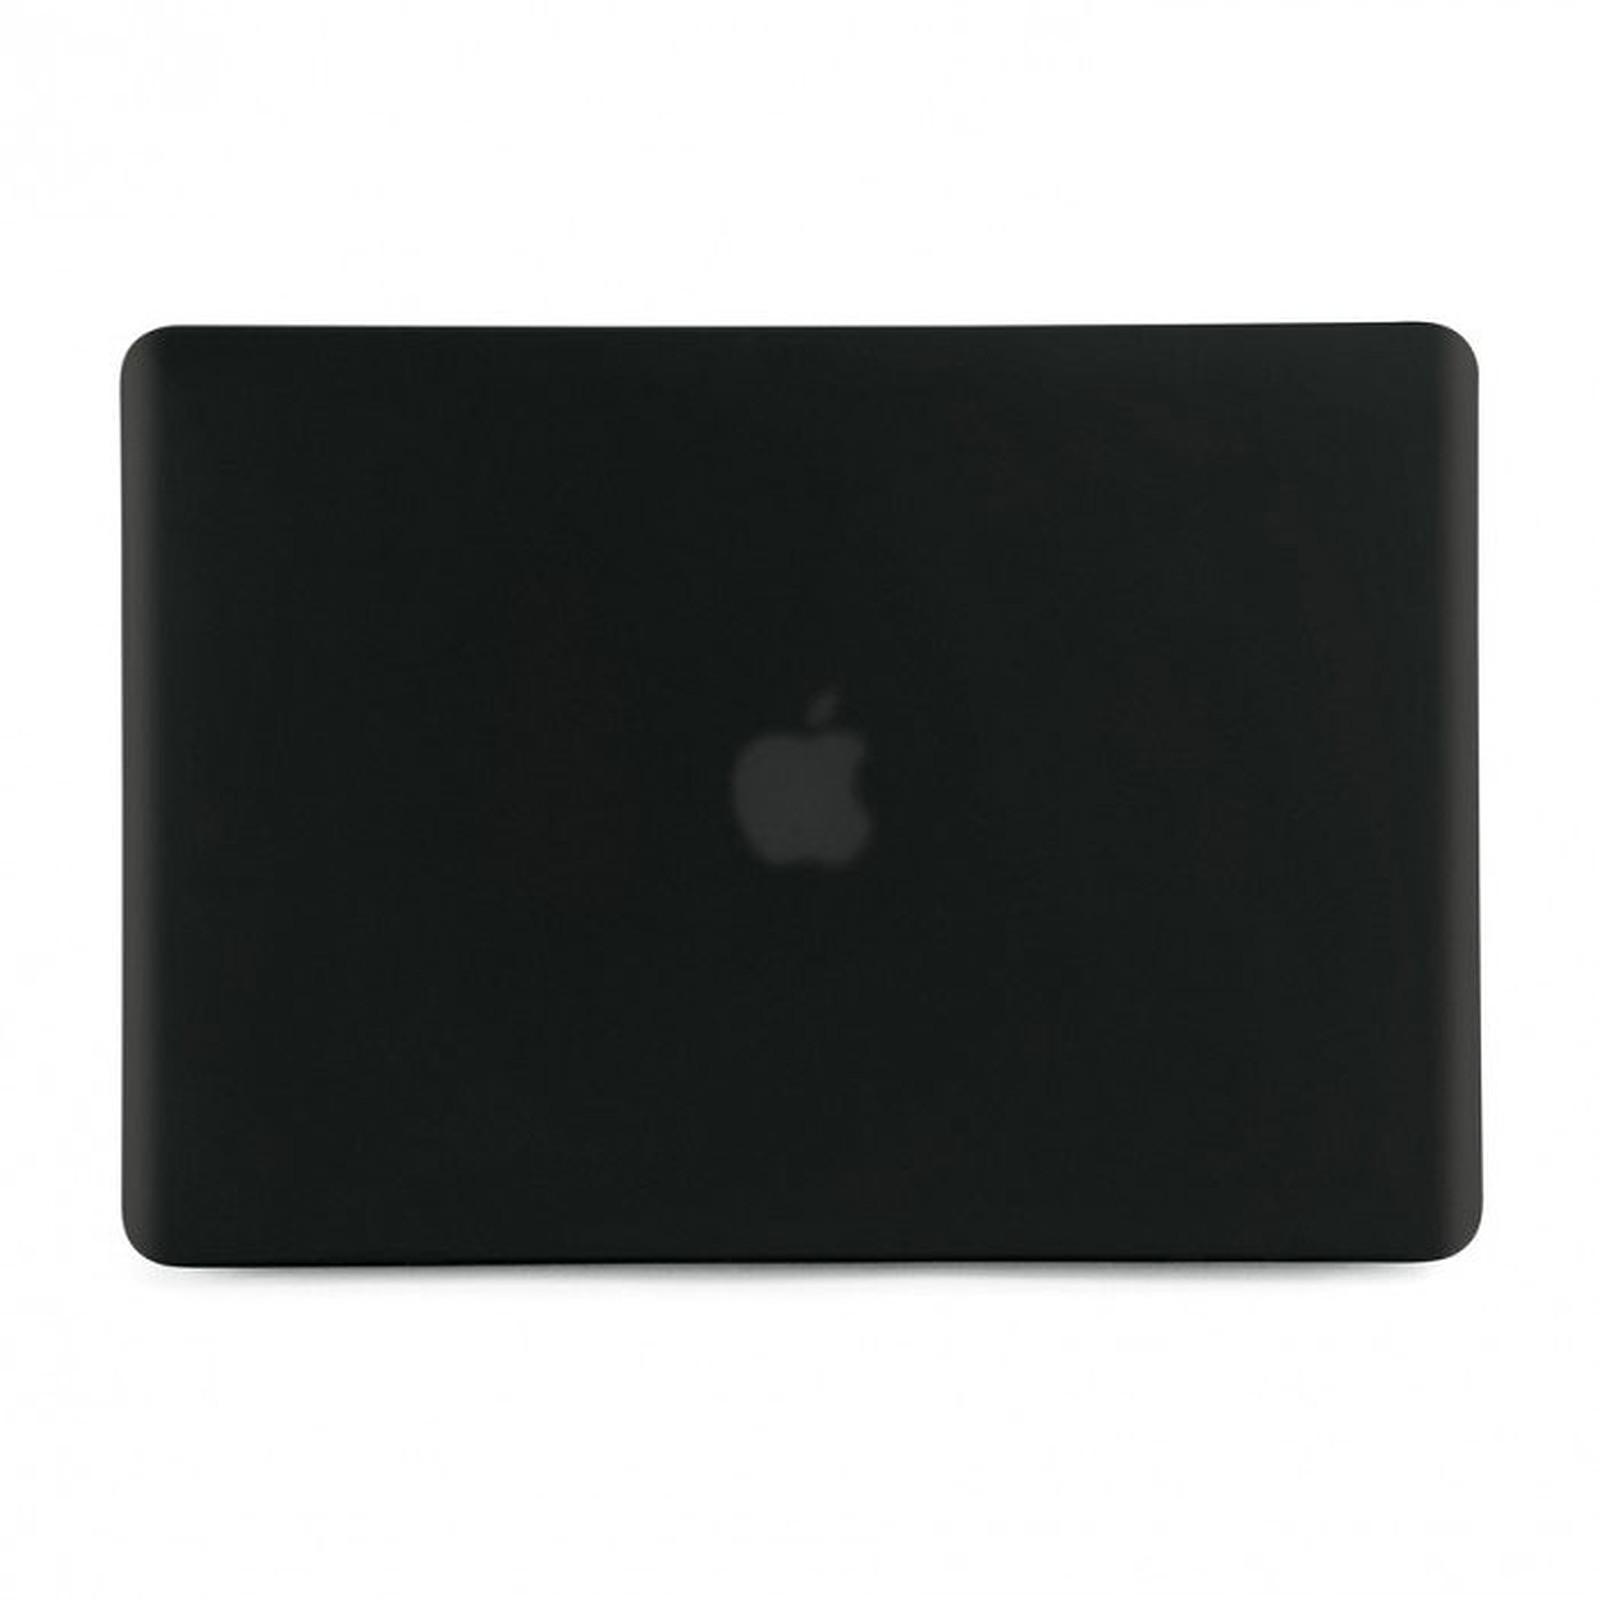 "Tucano Nido MacBook Air 13"" (negro)"